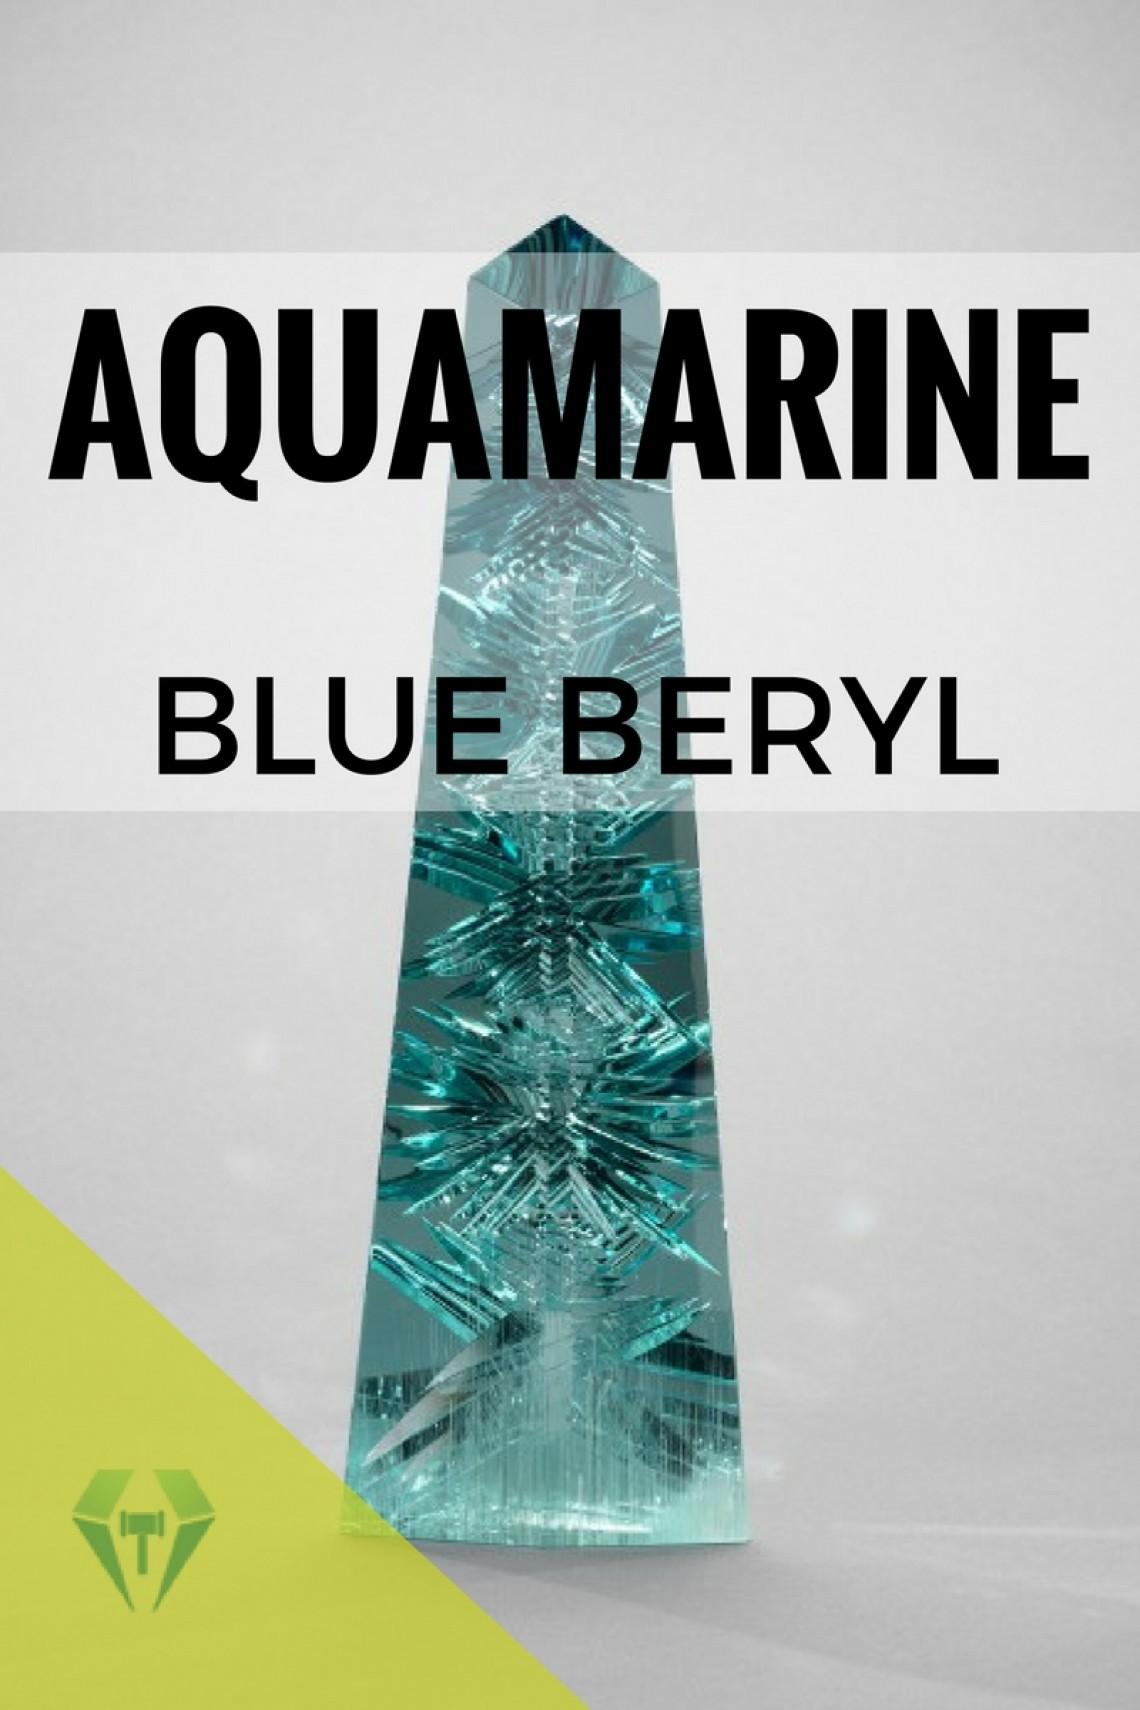 Aquamarine Information - The Blue Beryl